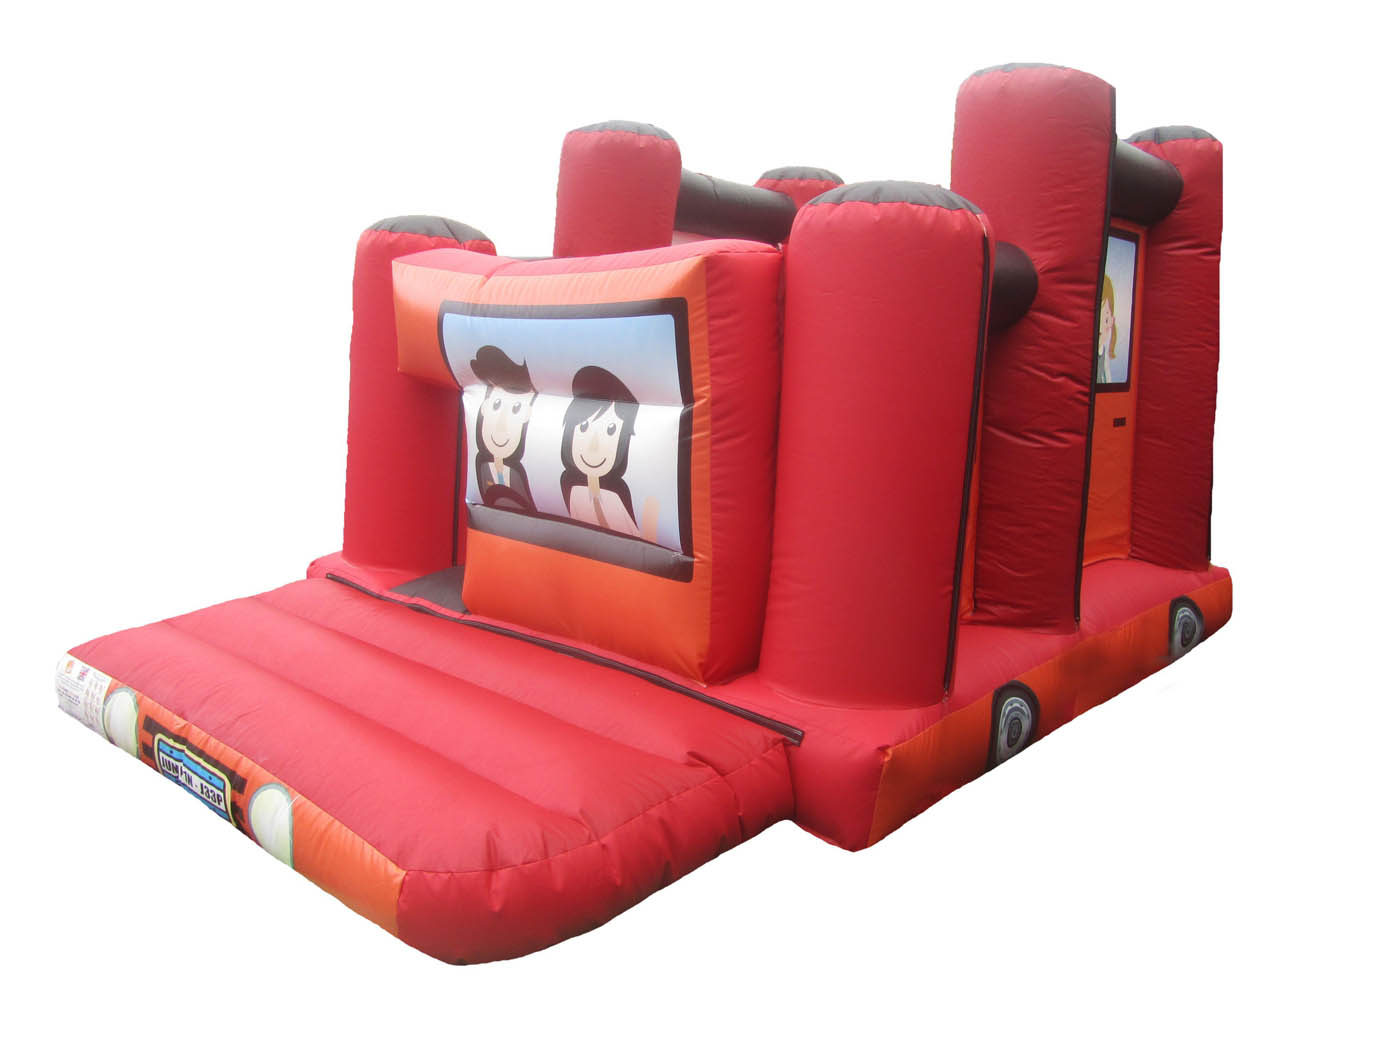 Jeep-ob-course-bouncy-castle-compressor